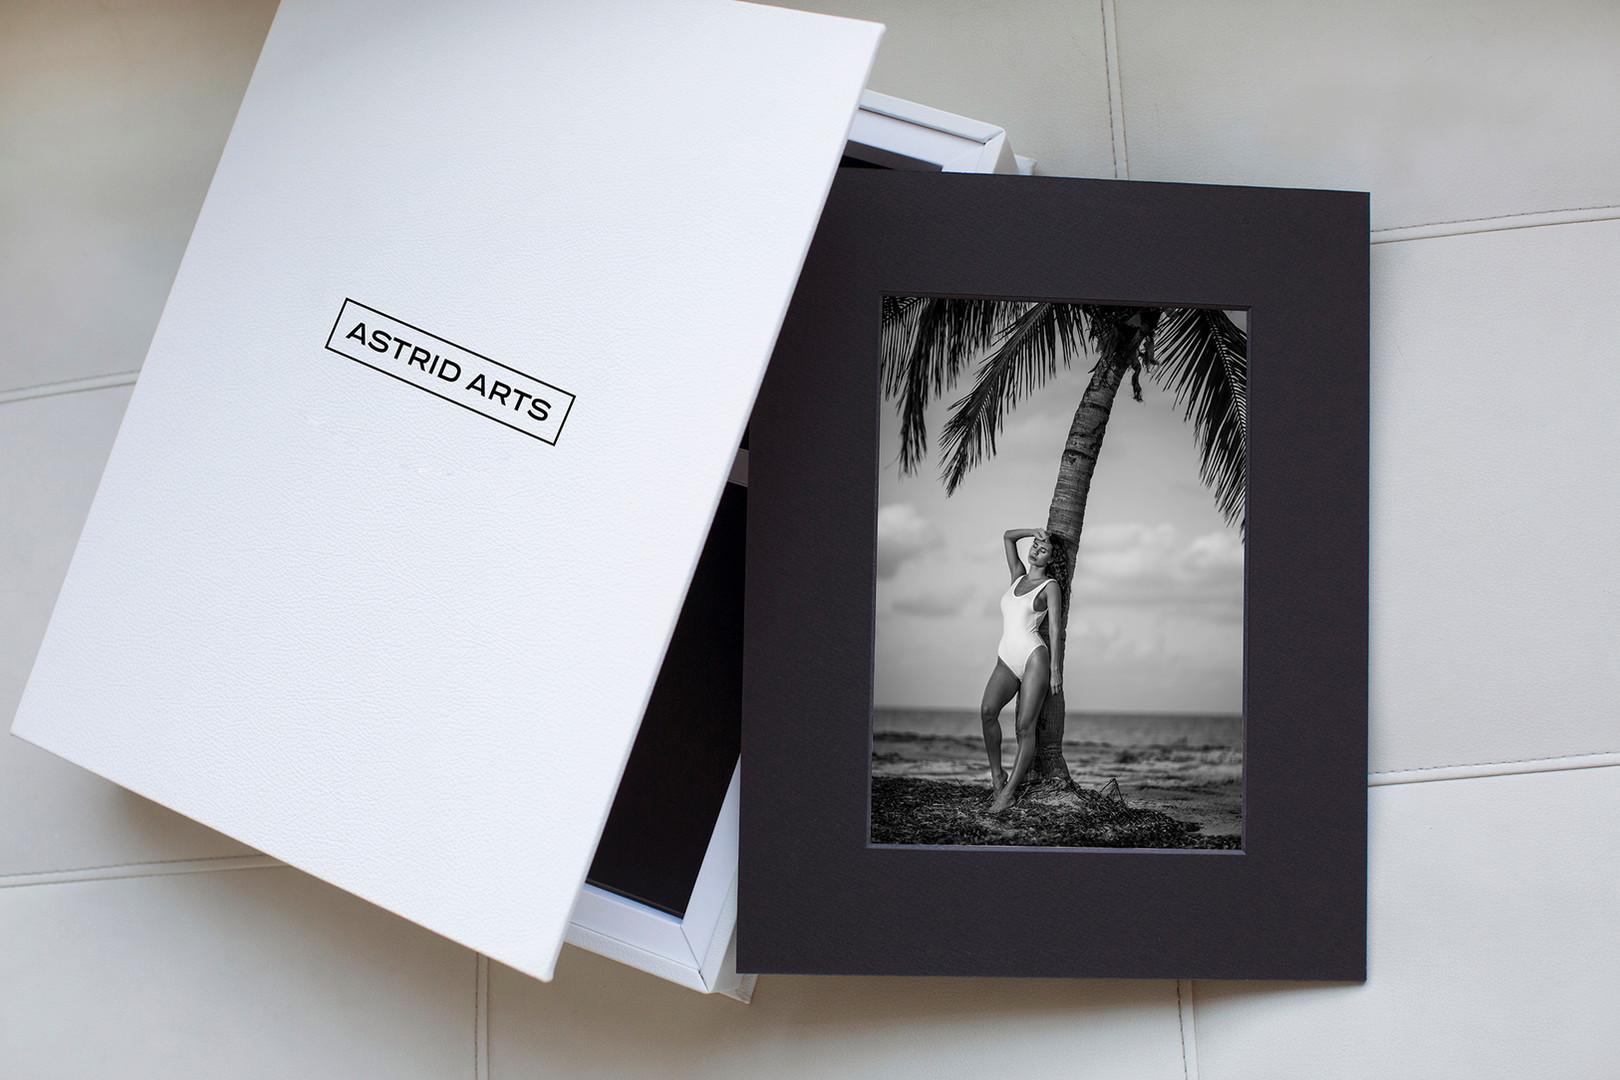 Luxury Boudoir Photography Folio Box with prints